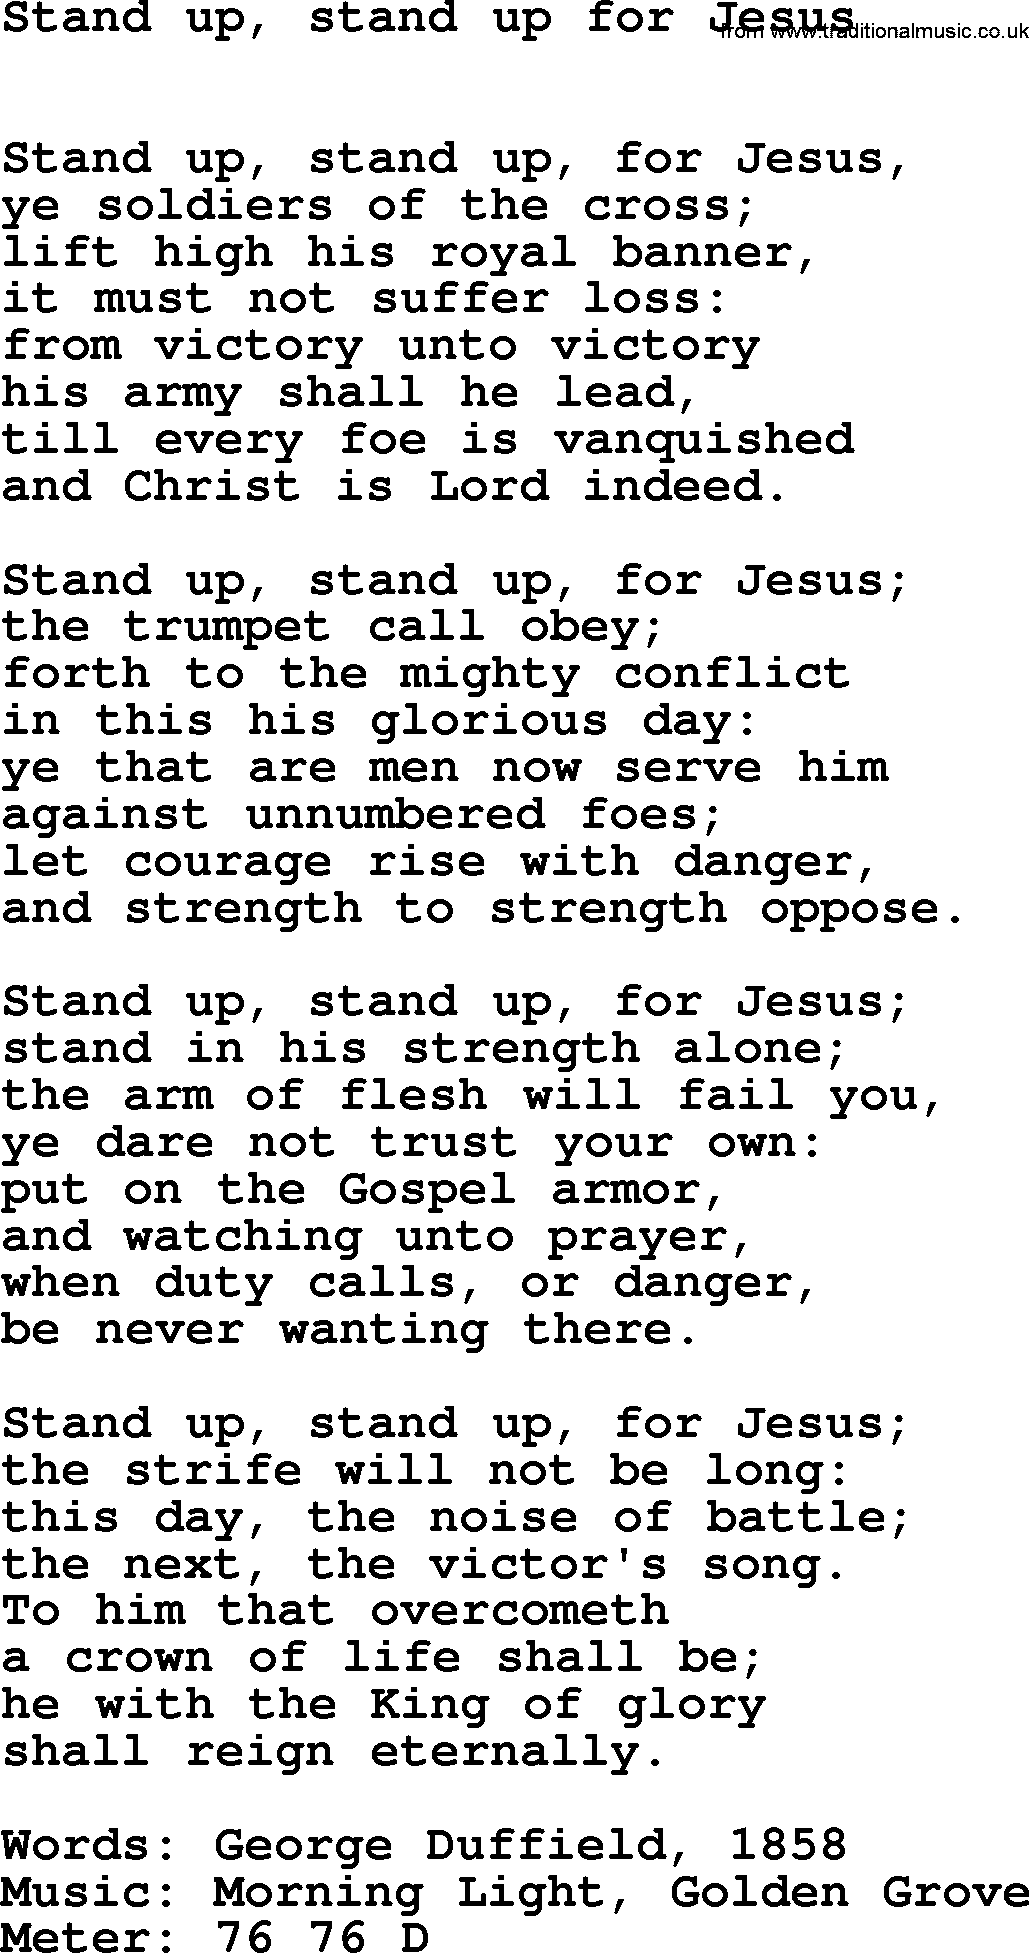 Stand Up Stand Up For Jesus Hymn Lyrics - LyricsWalls